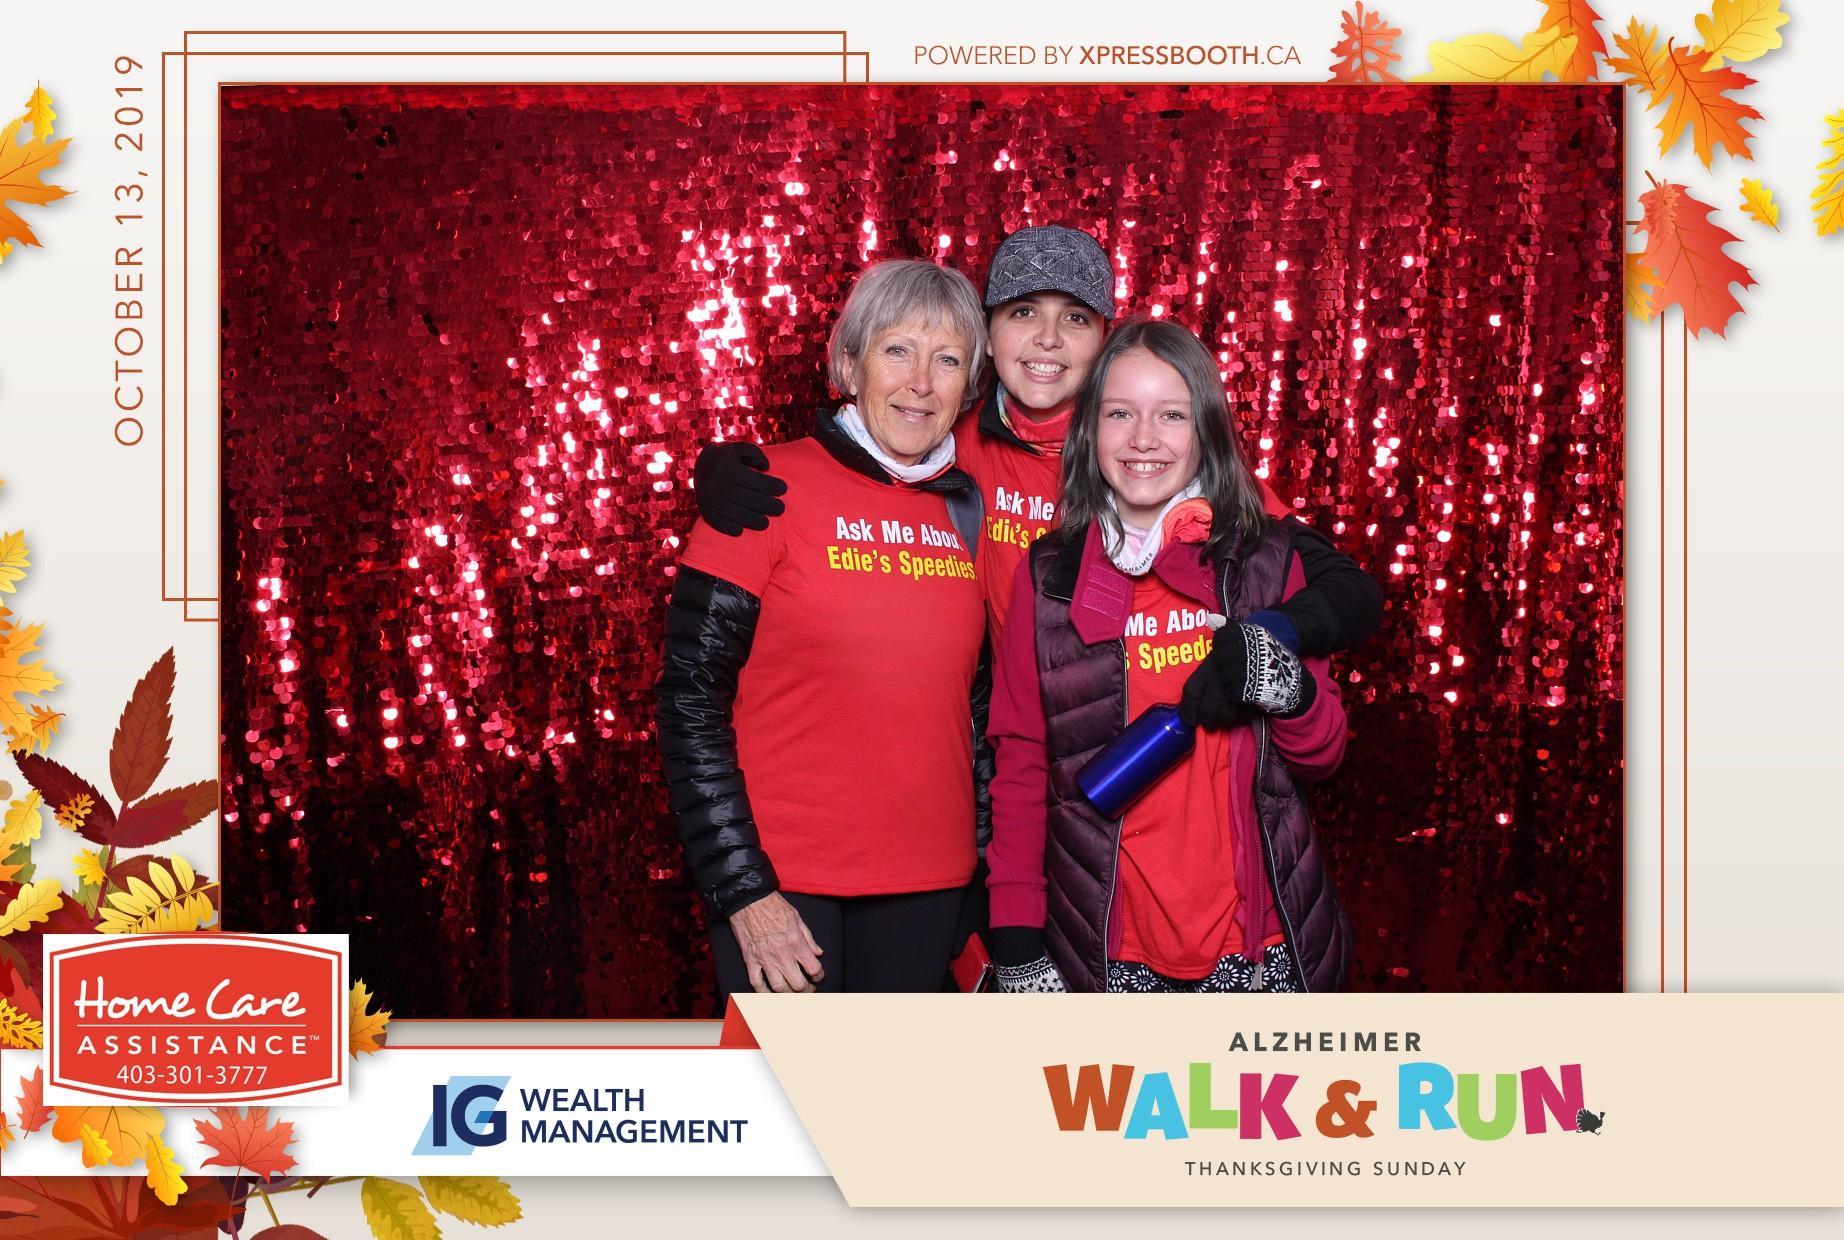 WalkRunAlzheimerSociety-0049-PRINT